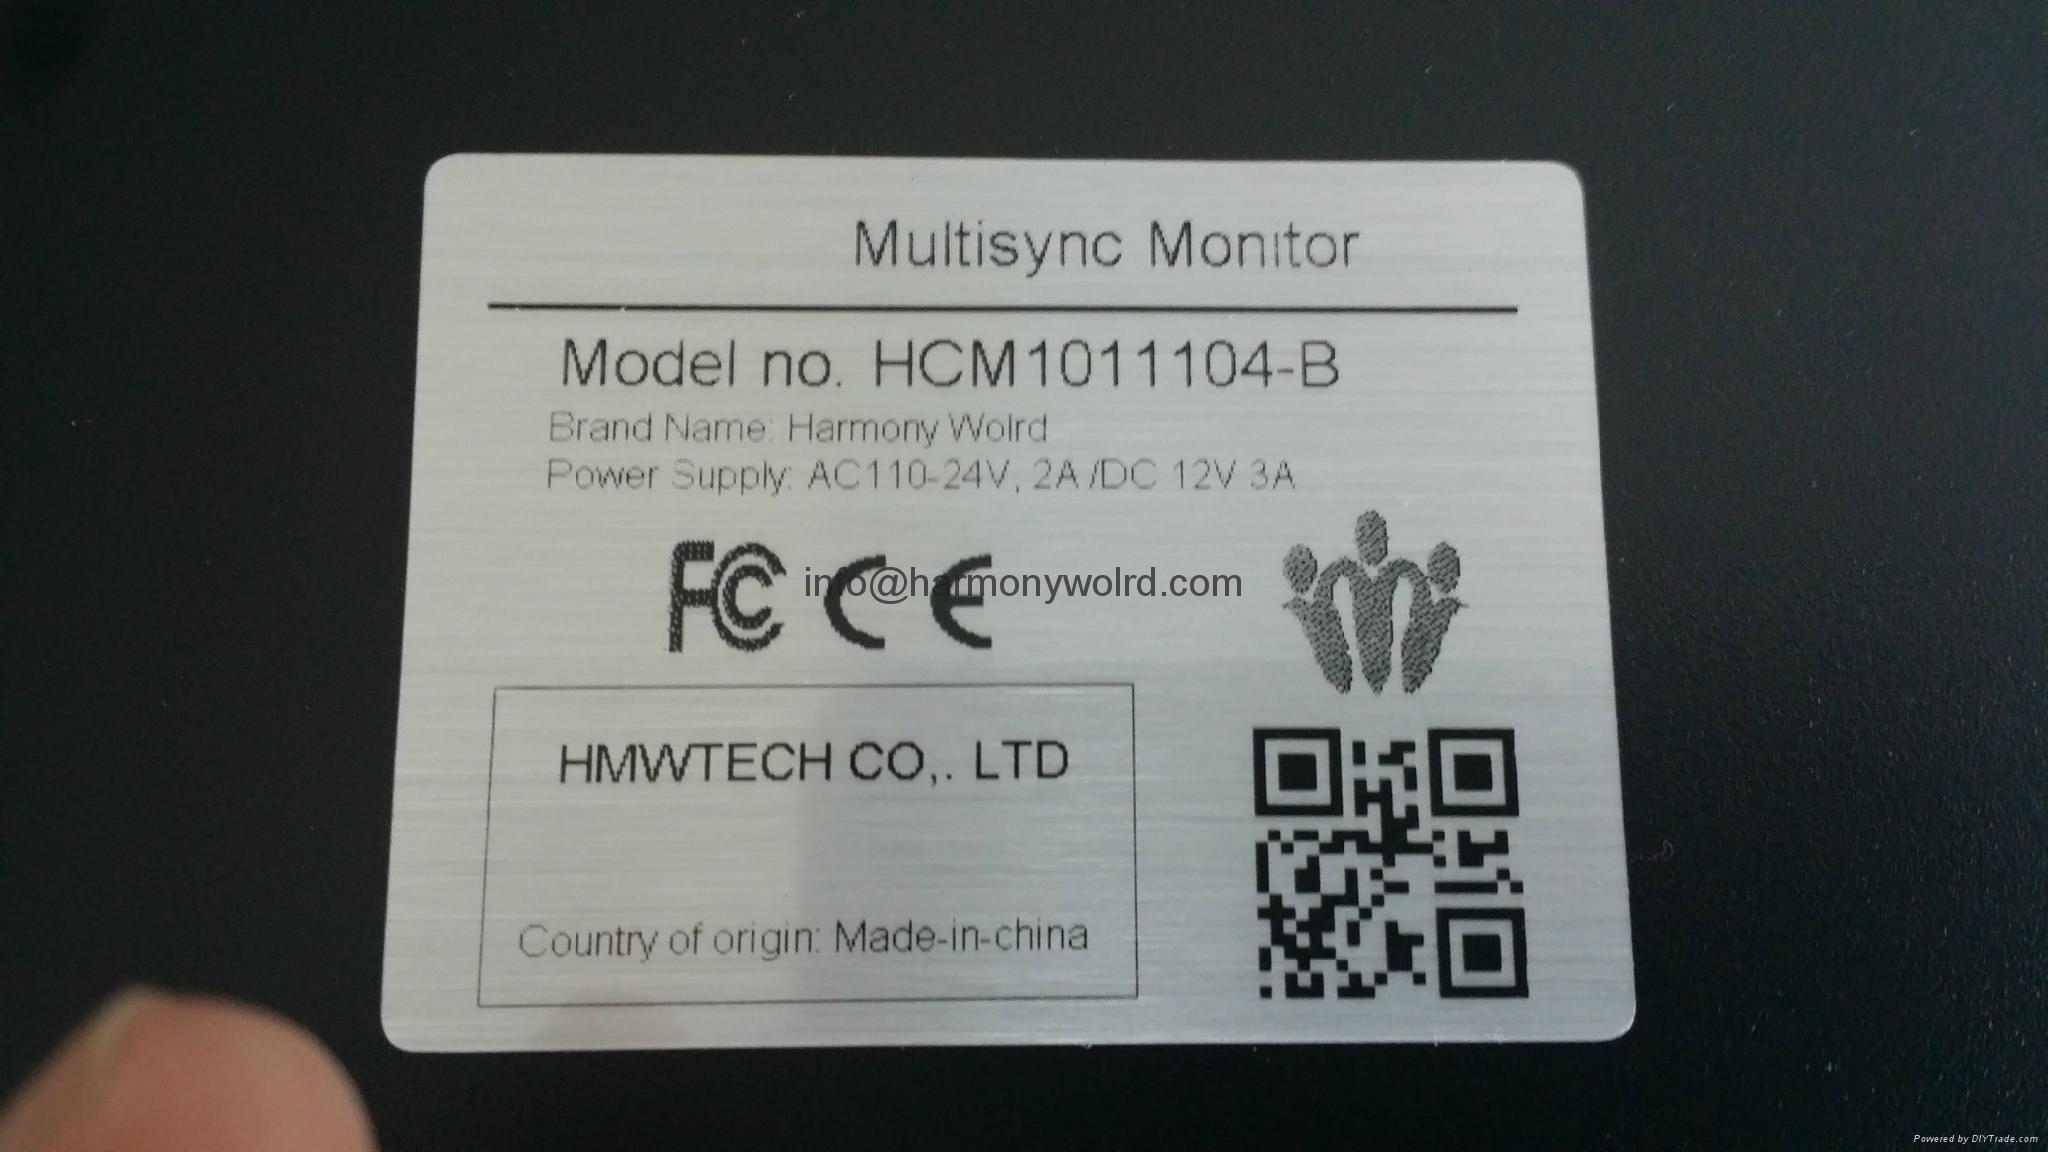 Upgrade PANASONIC monitor 3A133658 TR-124A WV-5410 CT-2084-Y CT-1331-Y WV-CM140B 4